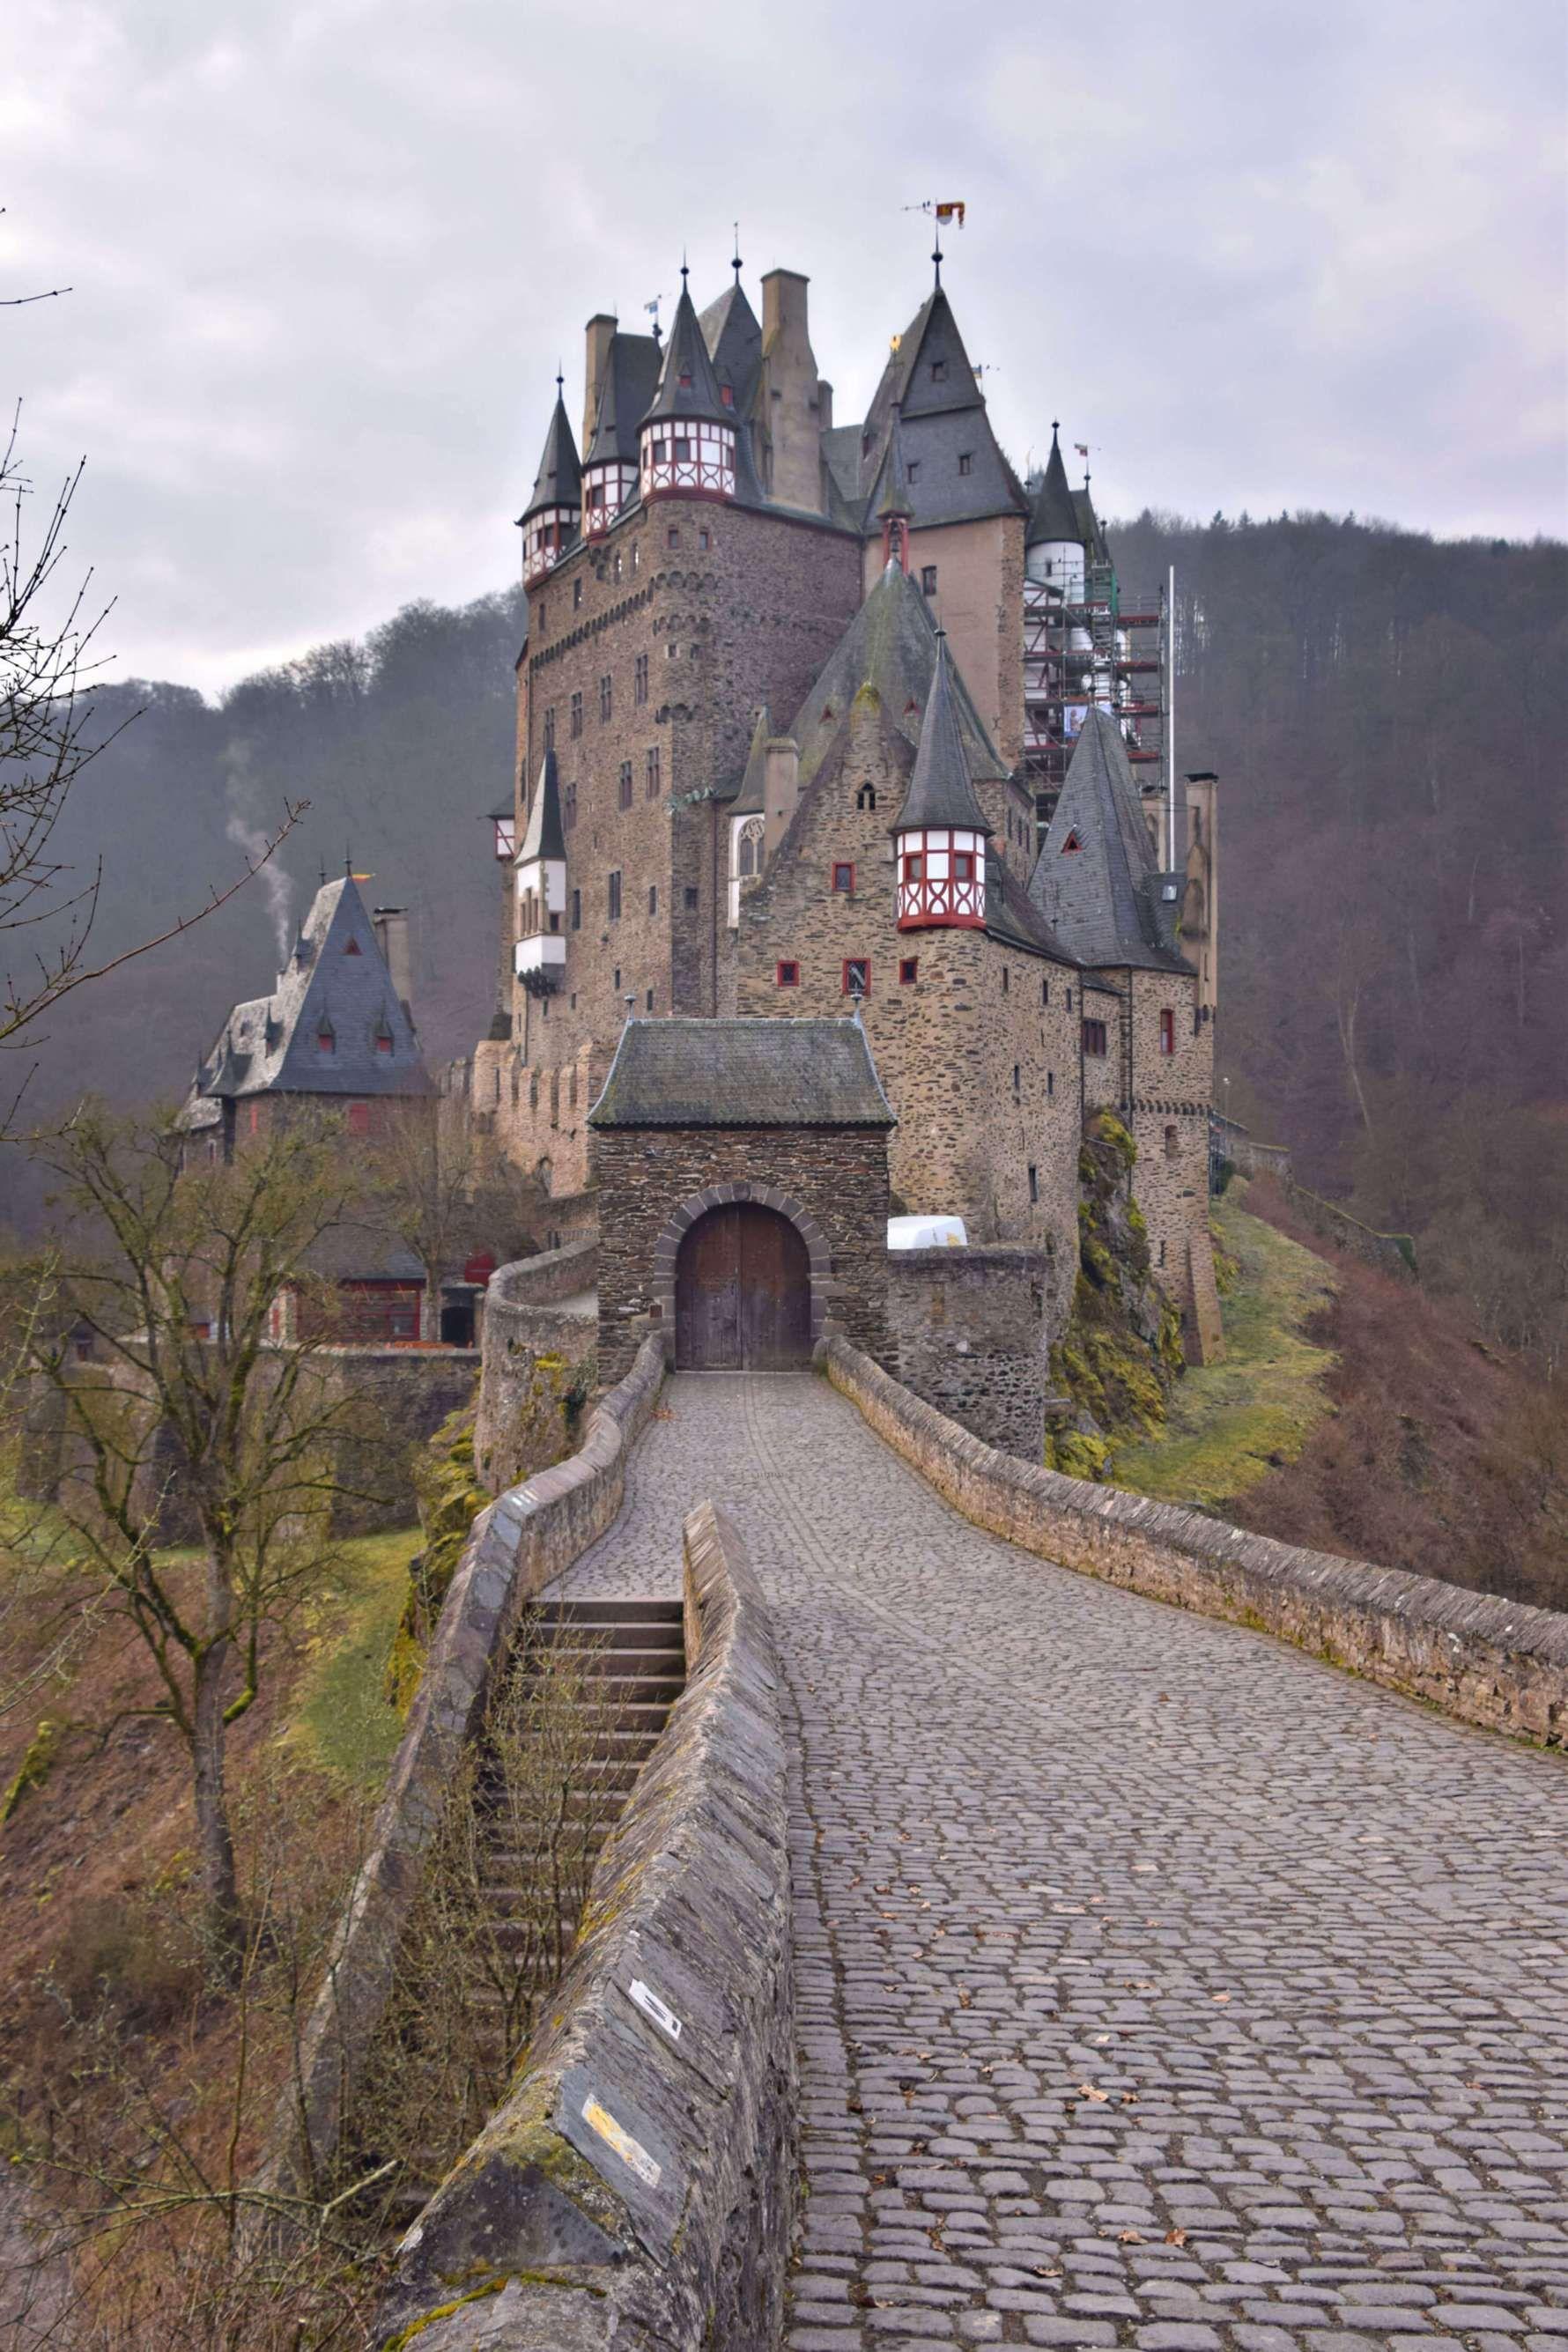 An Enchanting Experience At The Burg Eltz Castle Burg Eltz Castle Germany Castles European Castles